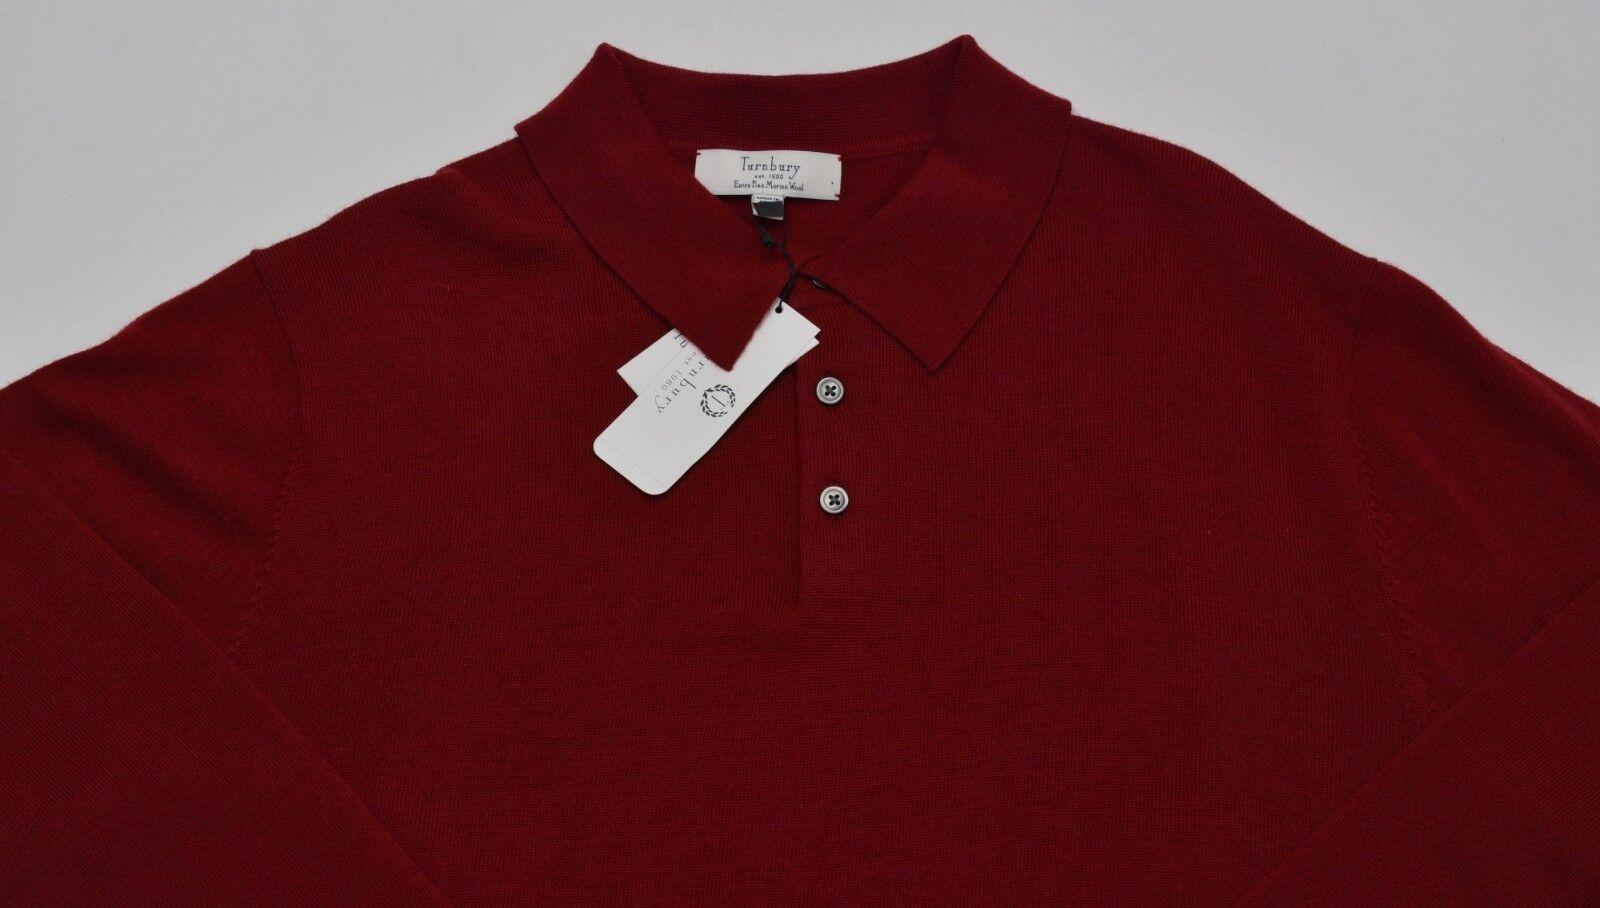 Men's TURNBURY True Red Merino Wool Knit Shirt Sweater Large L NEW NWT